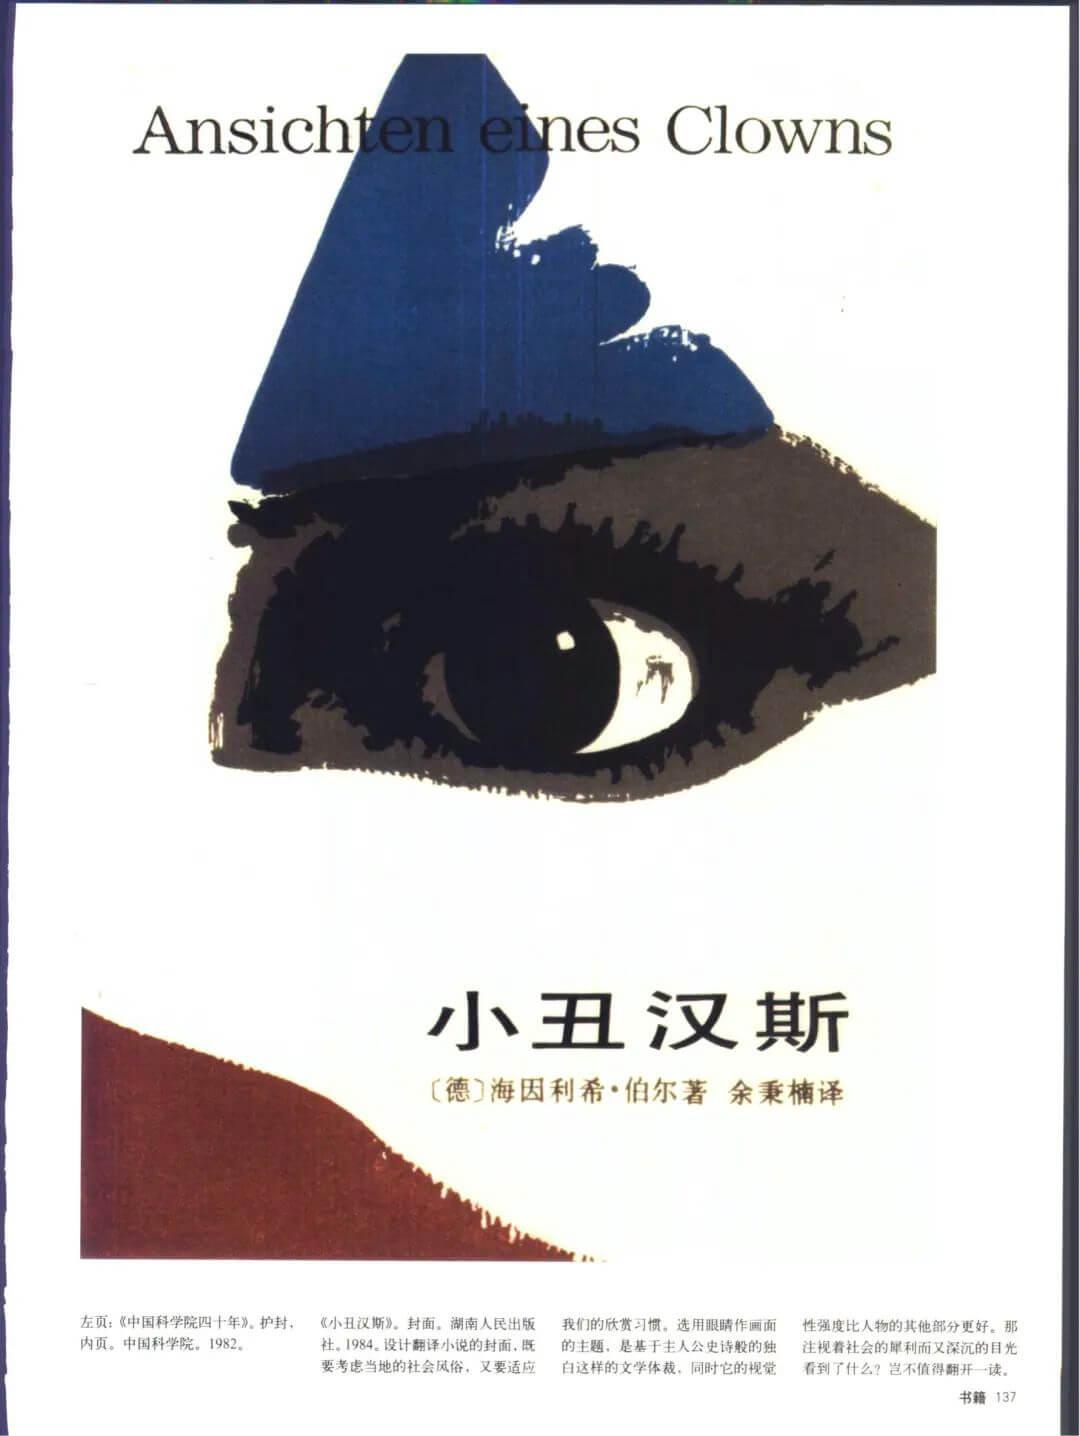 https://cdn1.zijia.com.cn/Public/Uploads/mainsort/mainsort_1598684570_8902.jpg